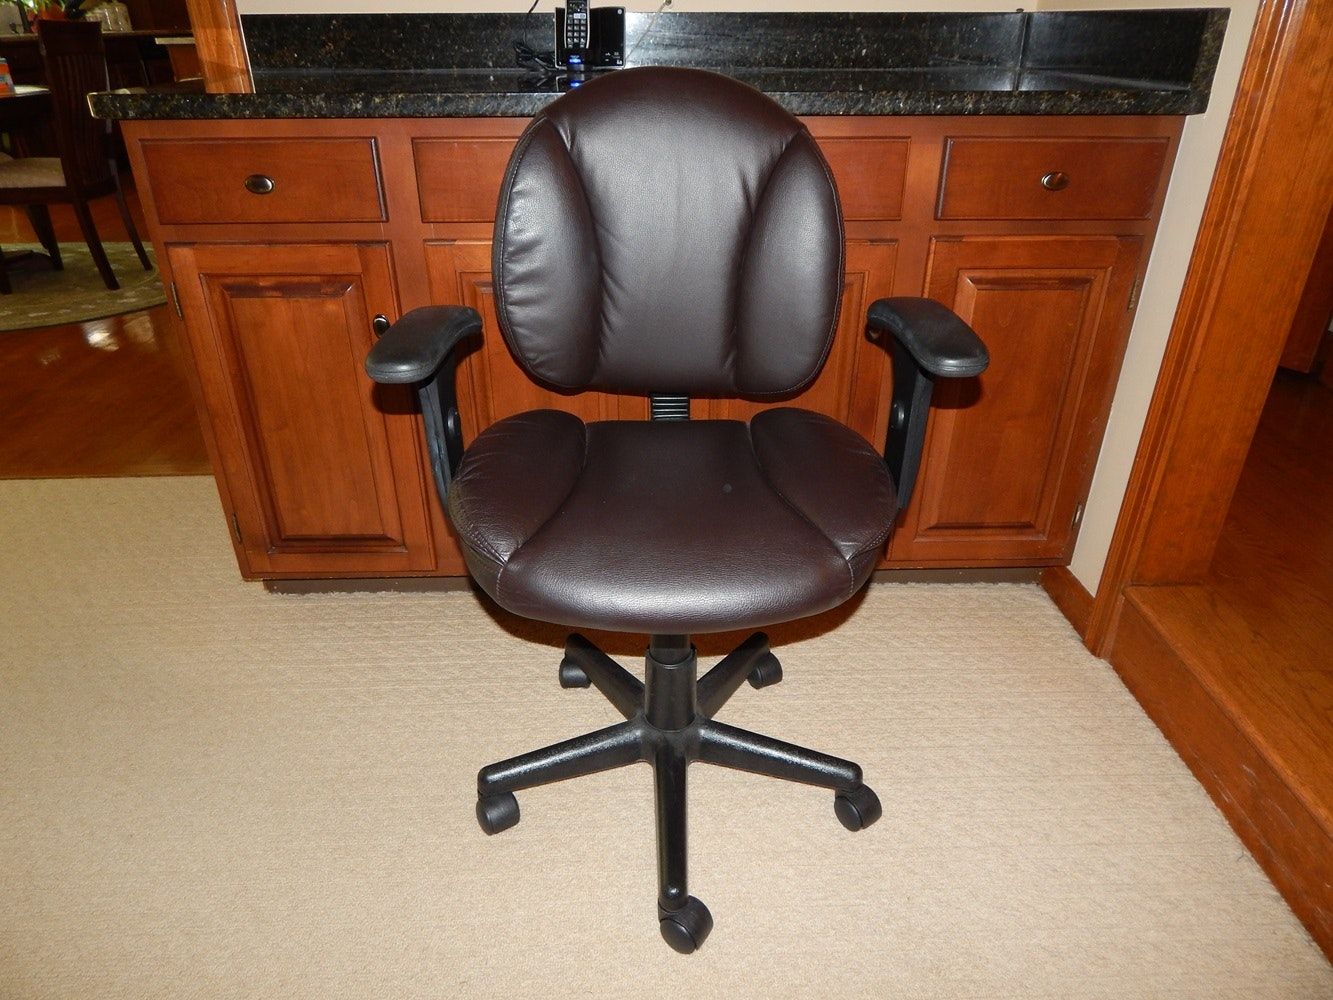 staples office chair ebth. Black Bedroom Furniture Sets. Home Design Ideas